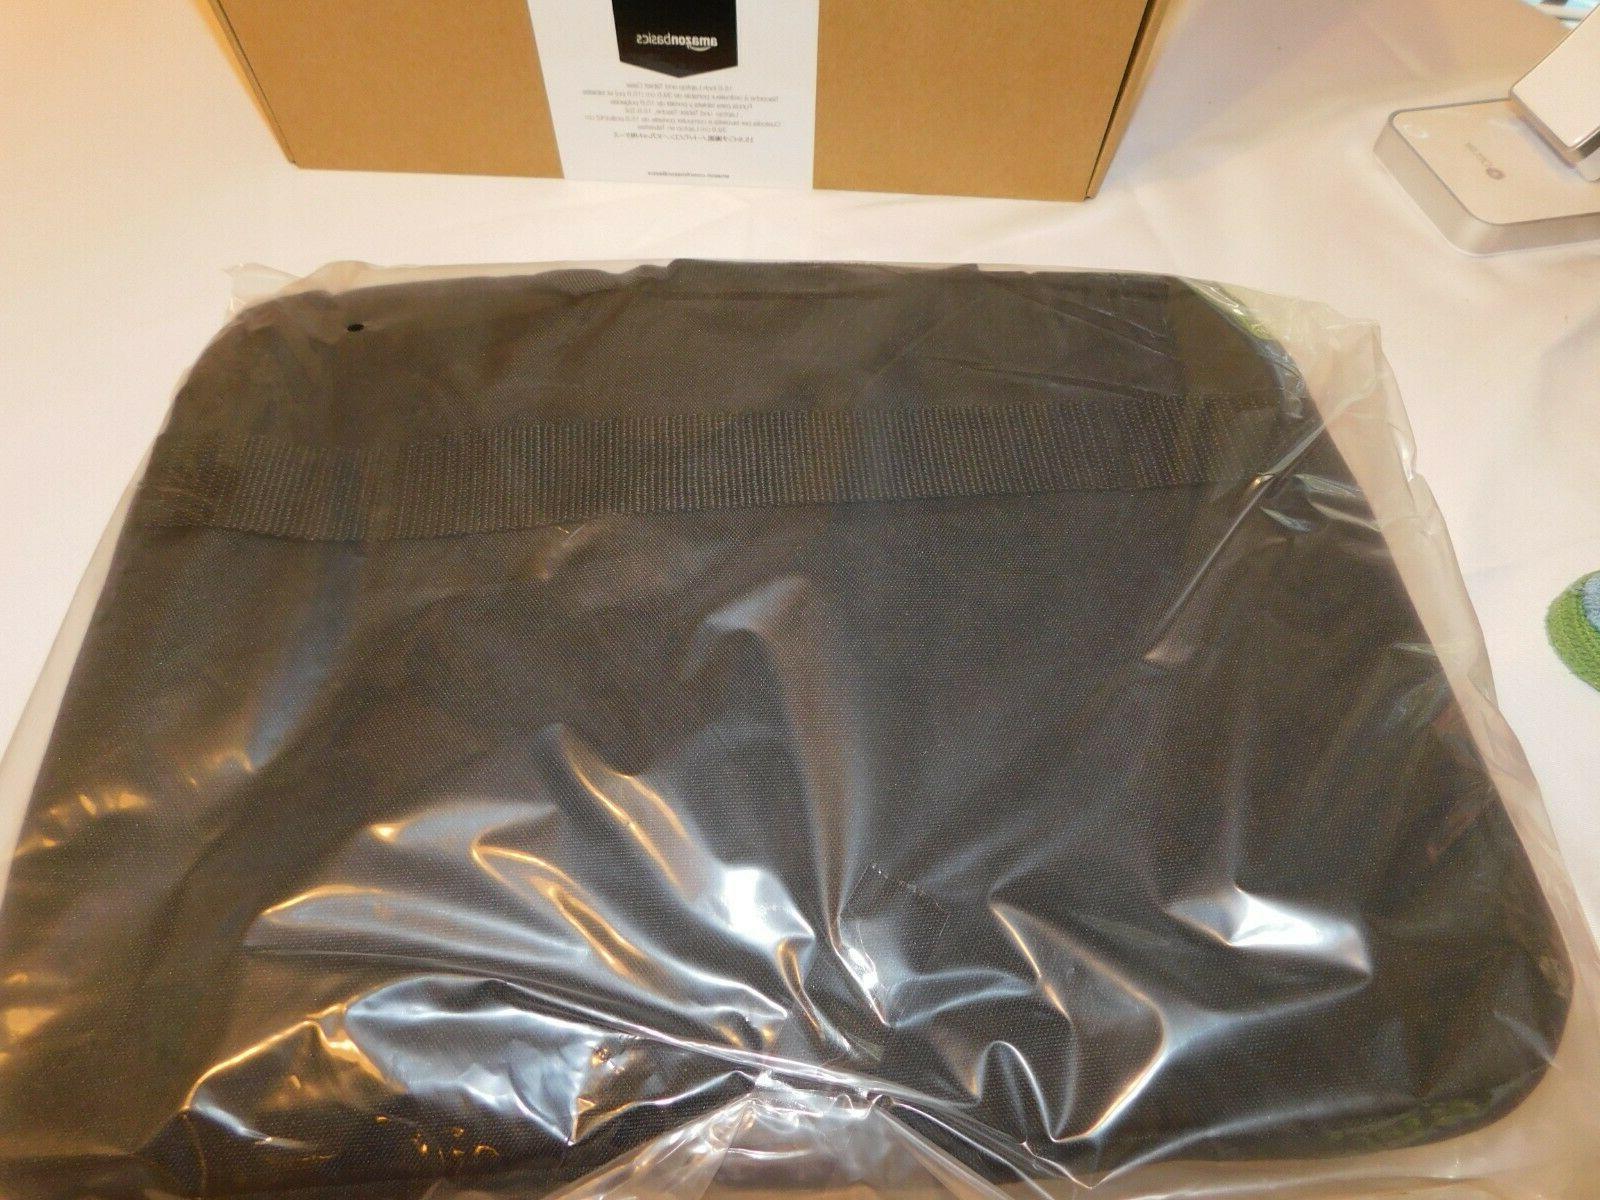 AmazonBasics 15.6-Inch Tablet Bag Case travel